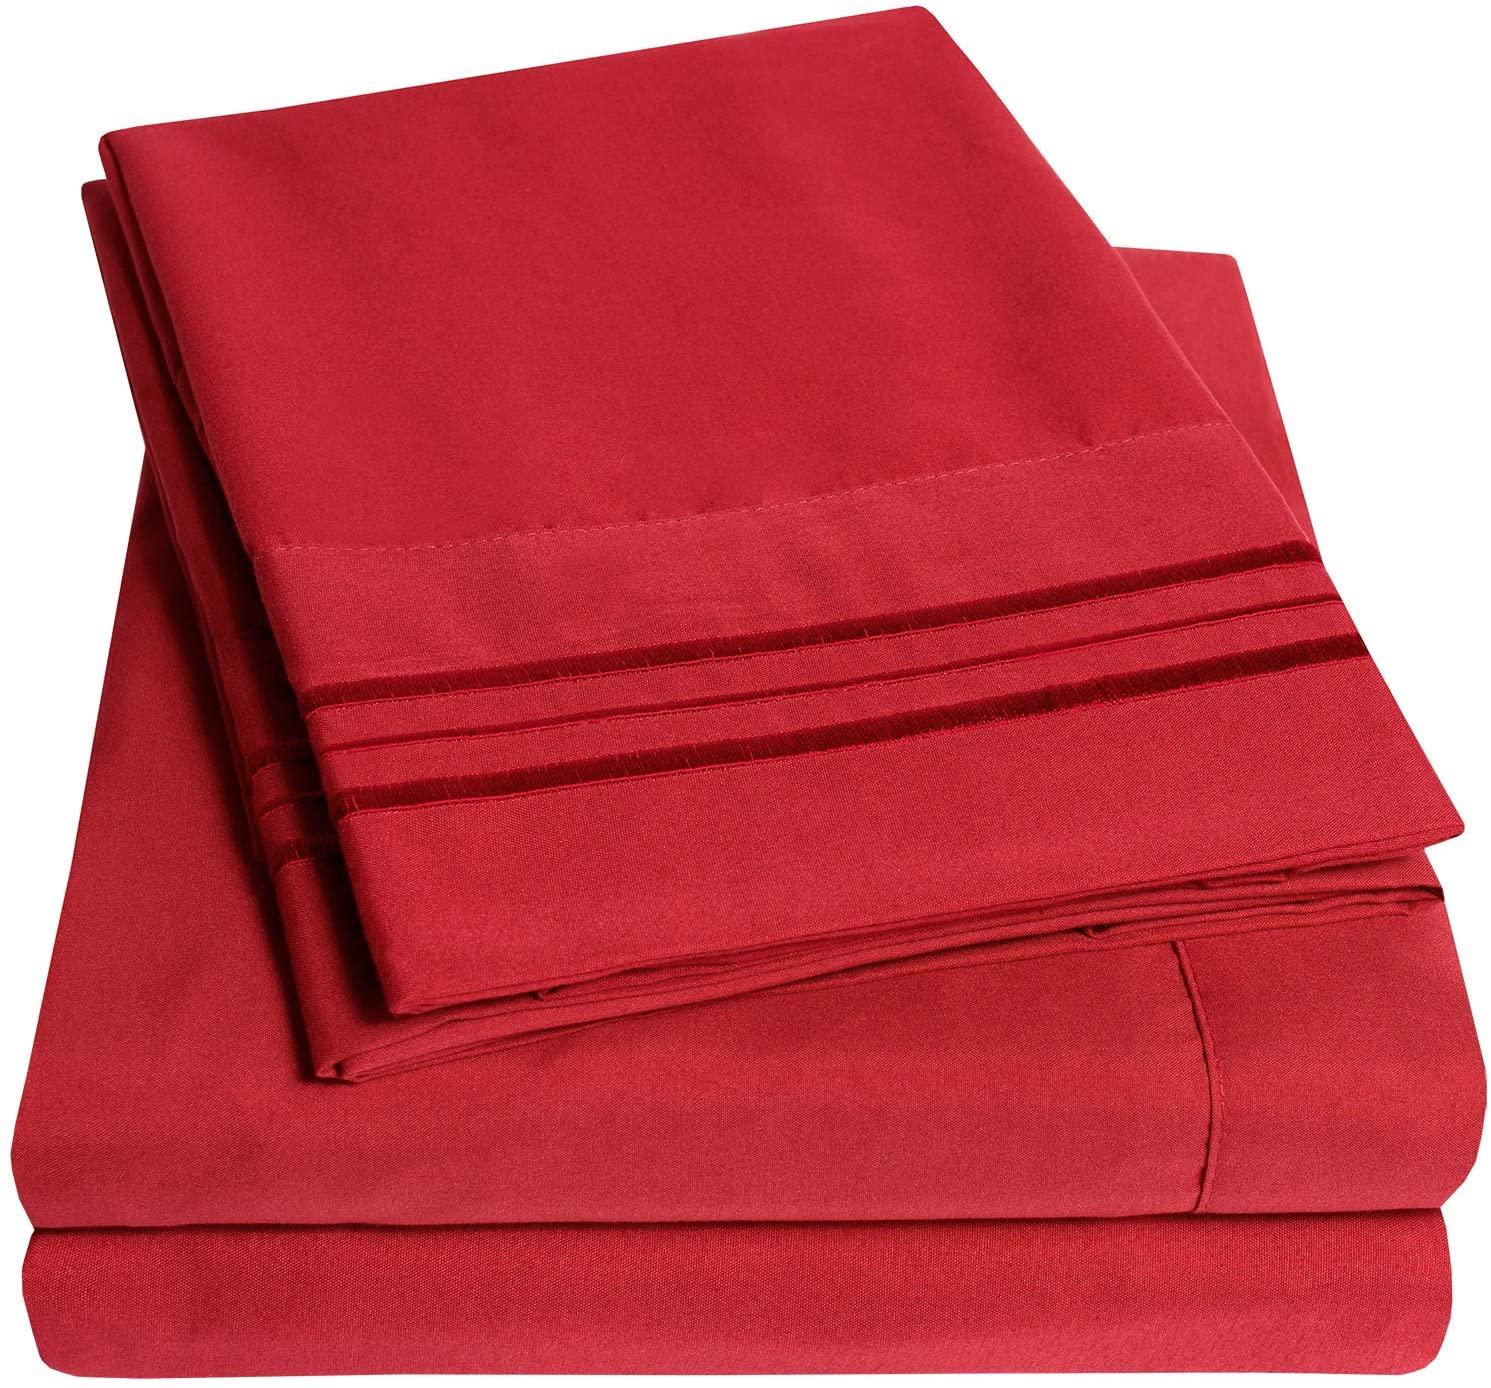 1500 Supreme Collection Bed Sheet Set - Extra Soft, Elastic Corner Straps, Deep Pockets, Wrinkle Free, Hypoallergenic Sheets Set, Luxury Hotel Bedding, King, Red